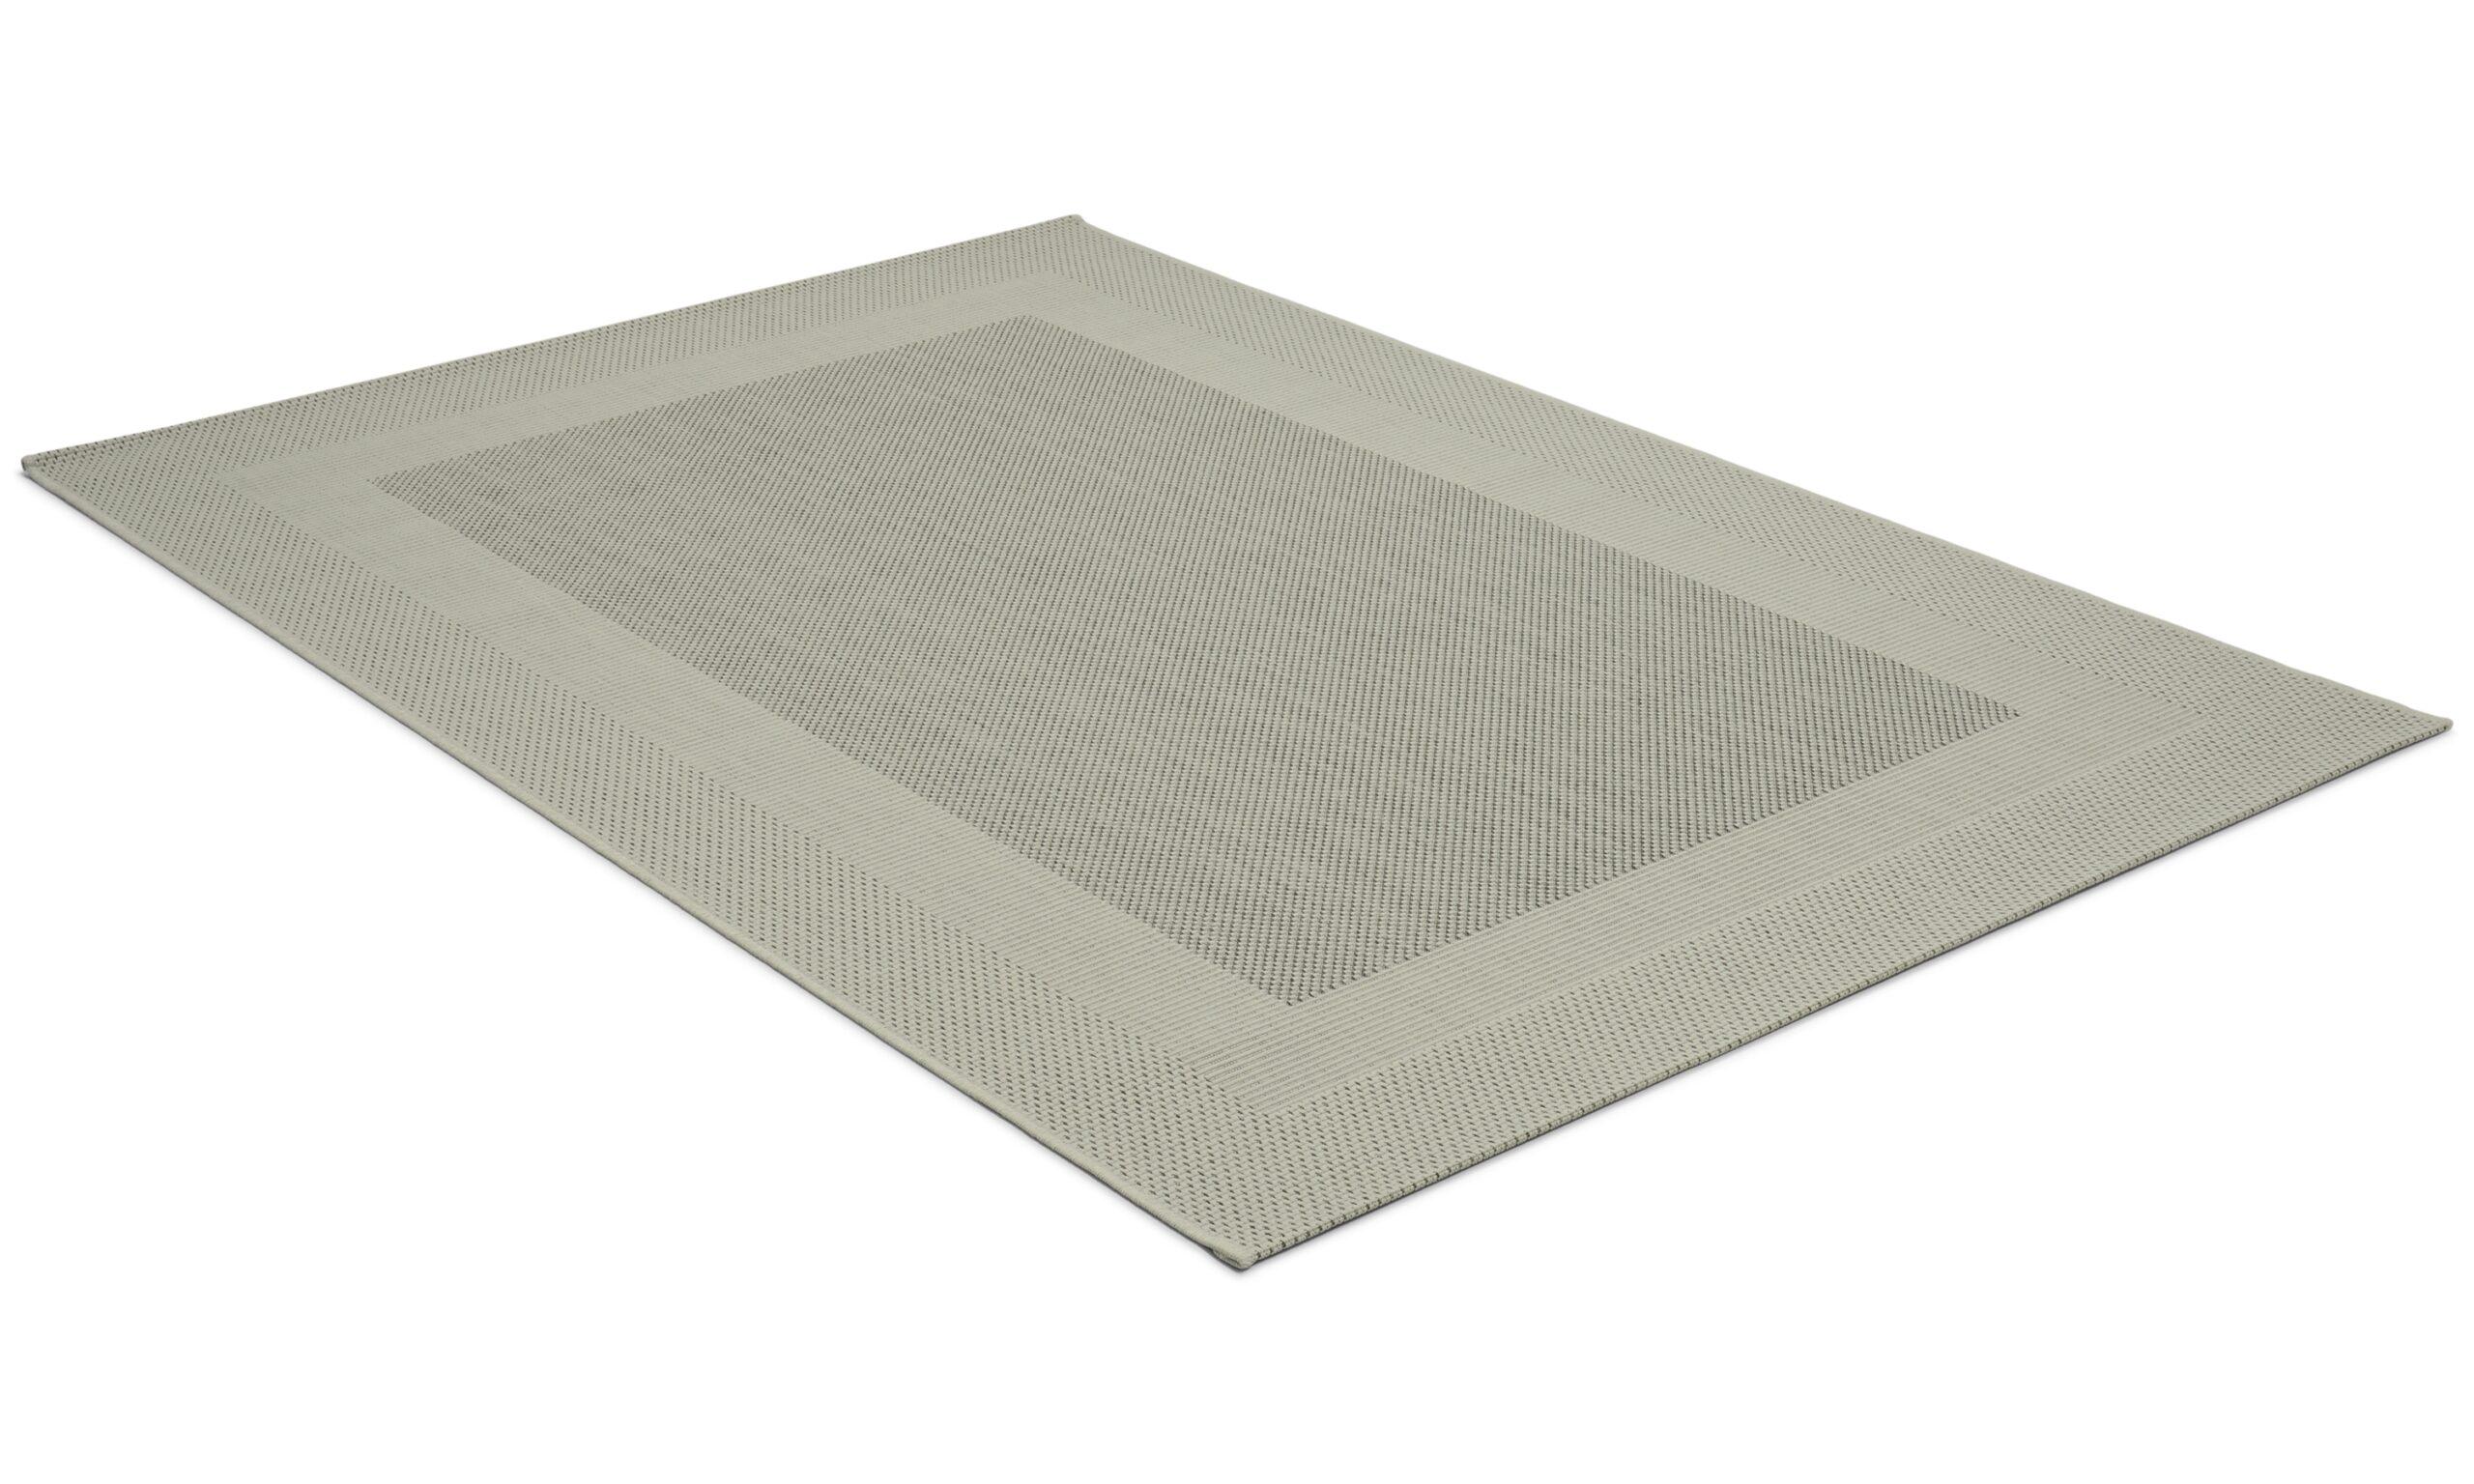 Adria lysegrå - flatvevd teppe